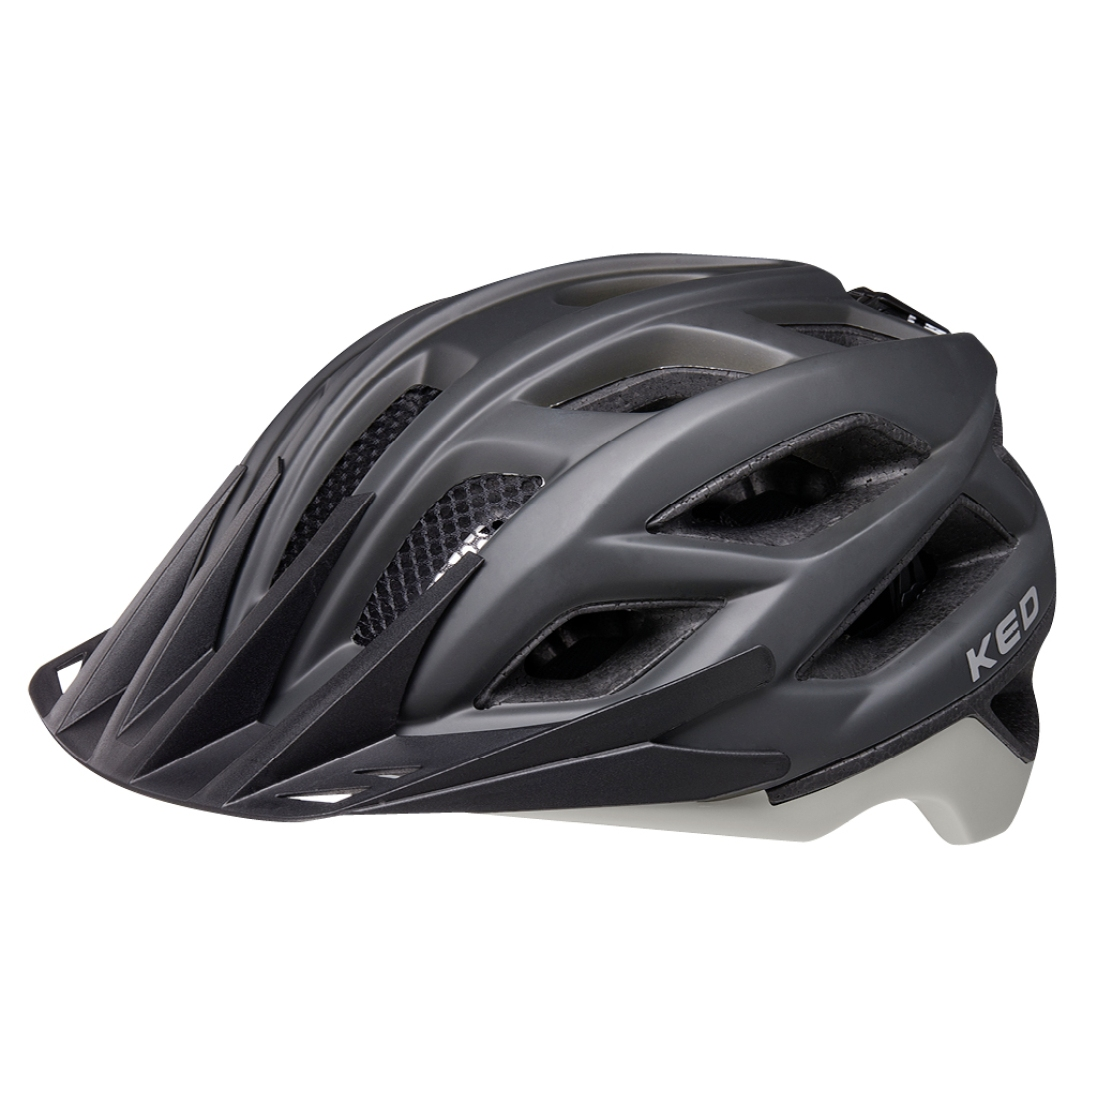 KED Companion Helm - process black matt